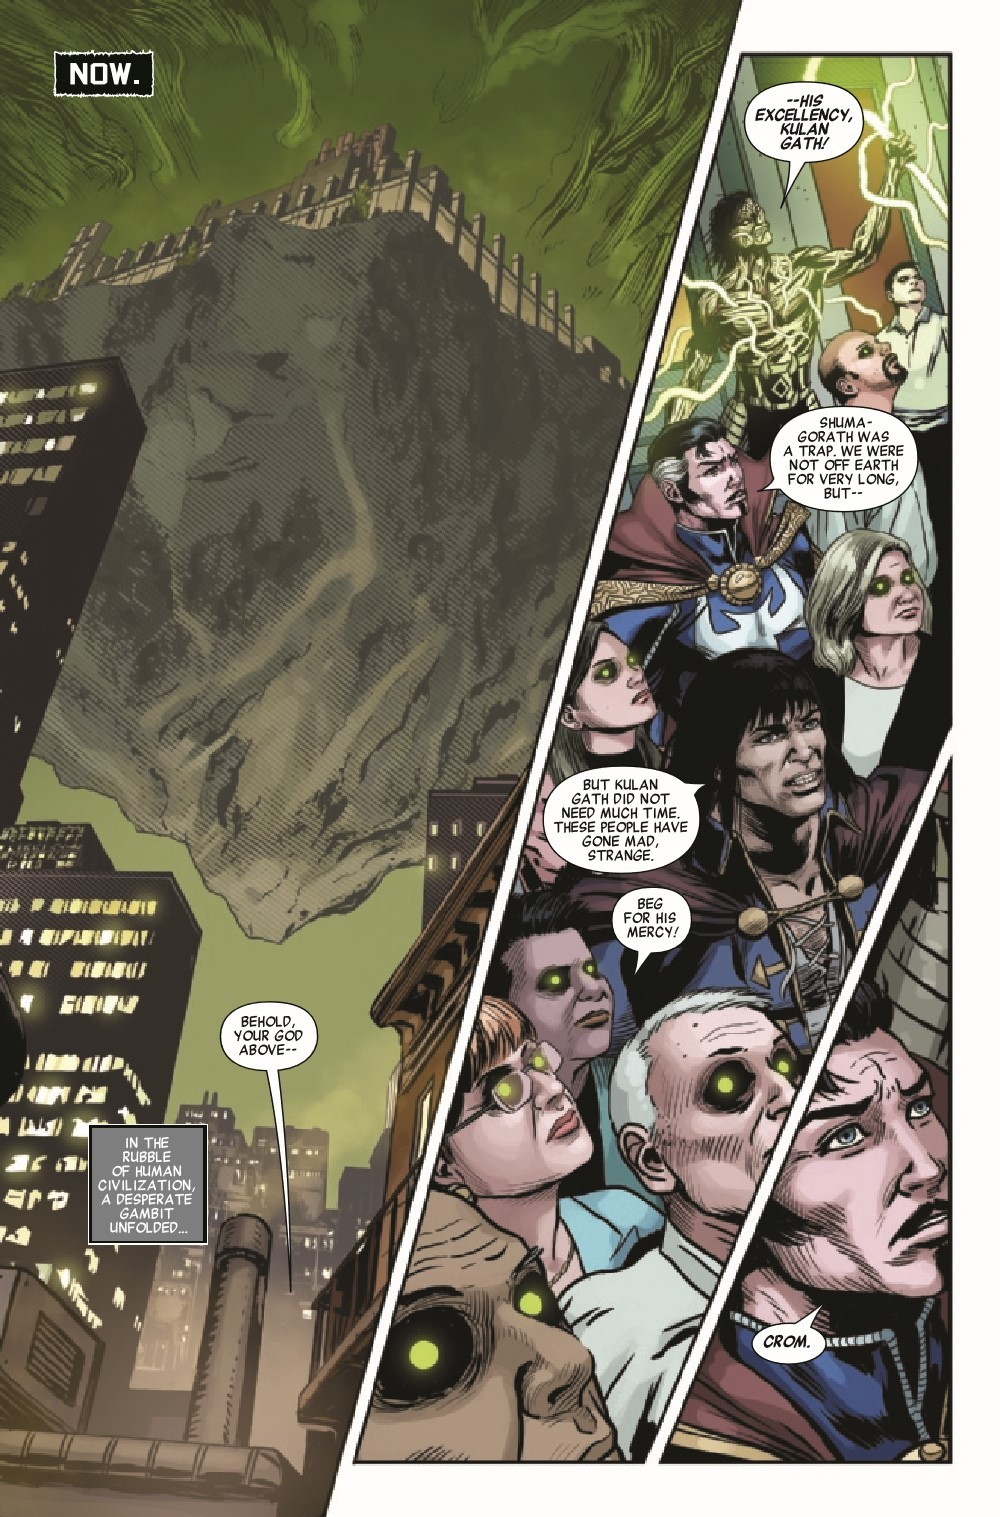 SAVAVEN2019024_Preview-3 ComicList Previews: SAVAGE AVENGERS #24